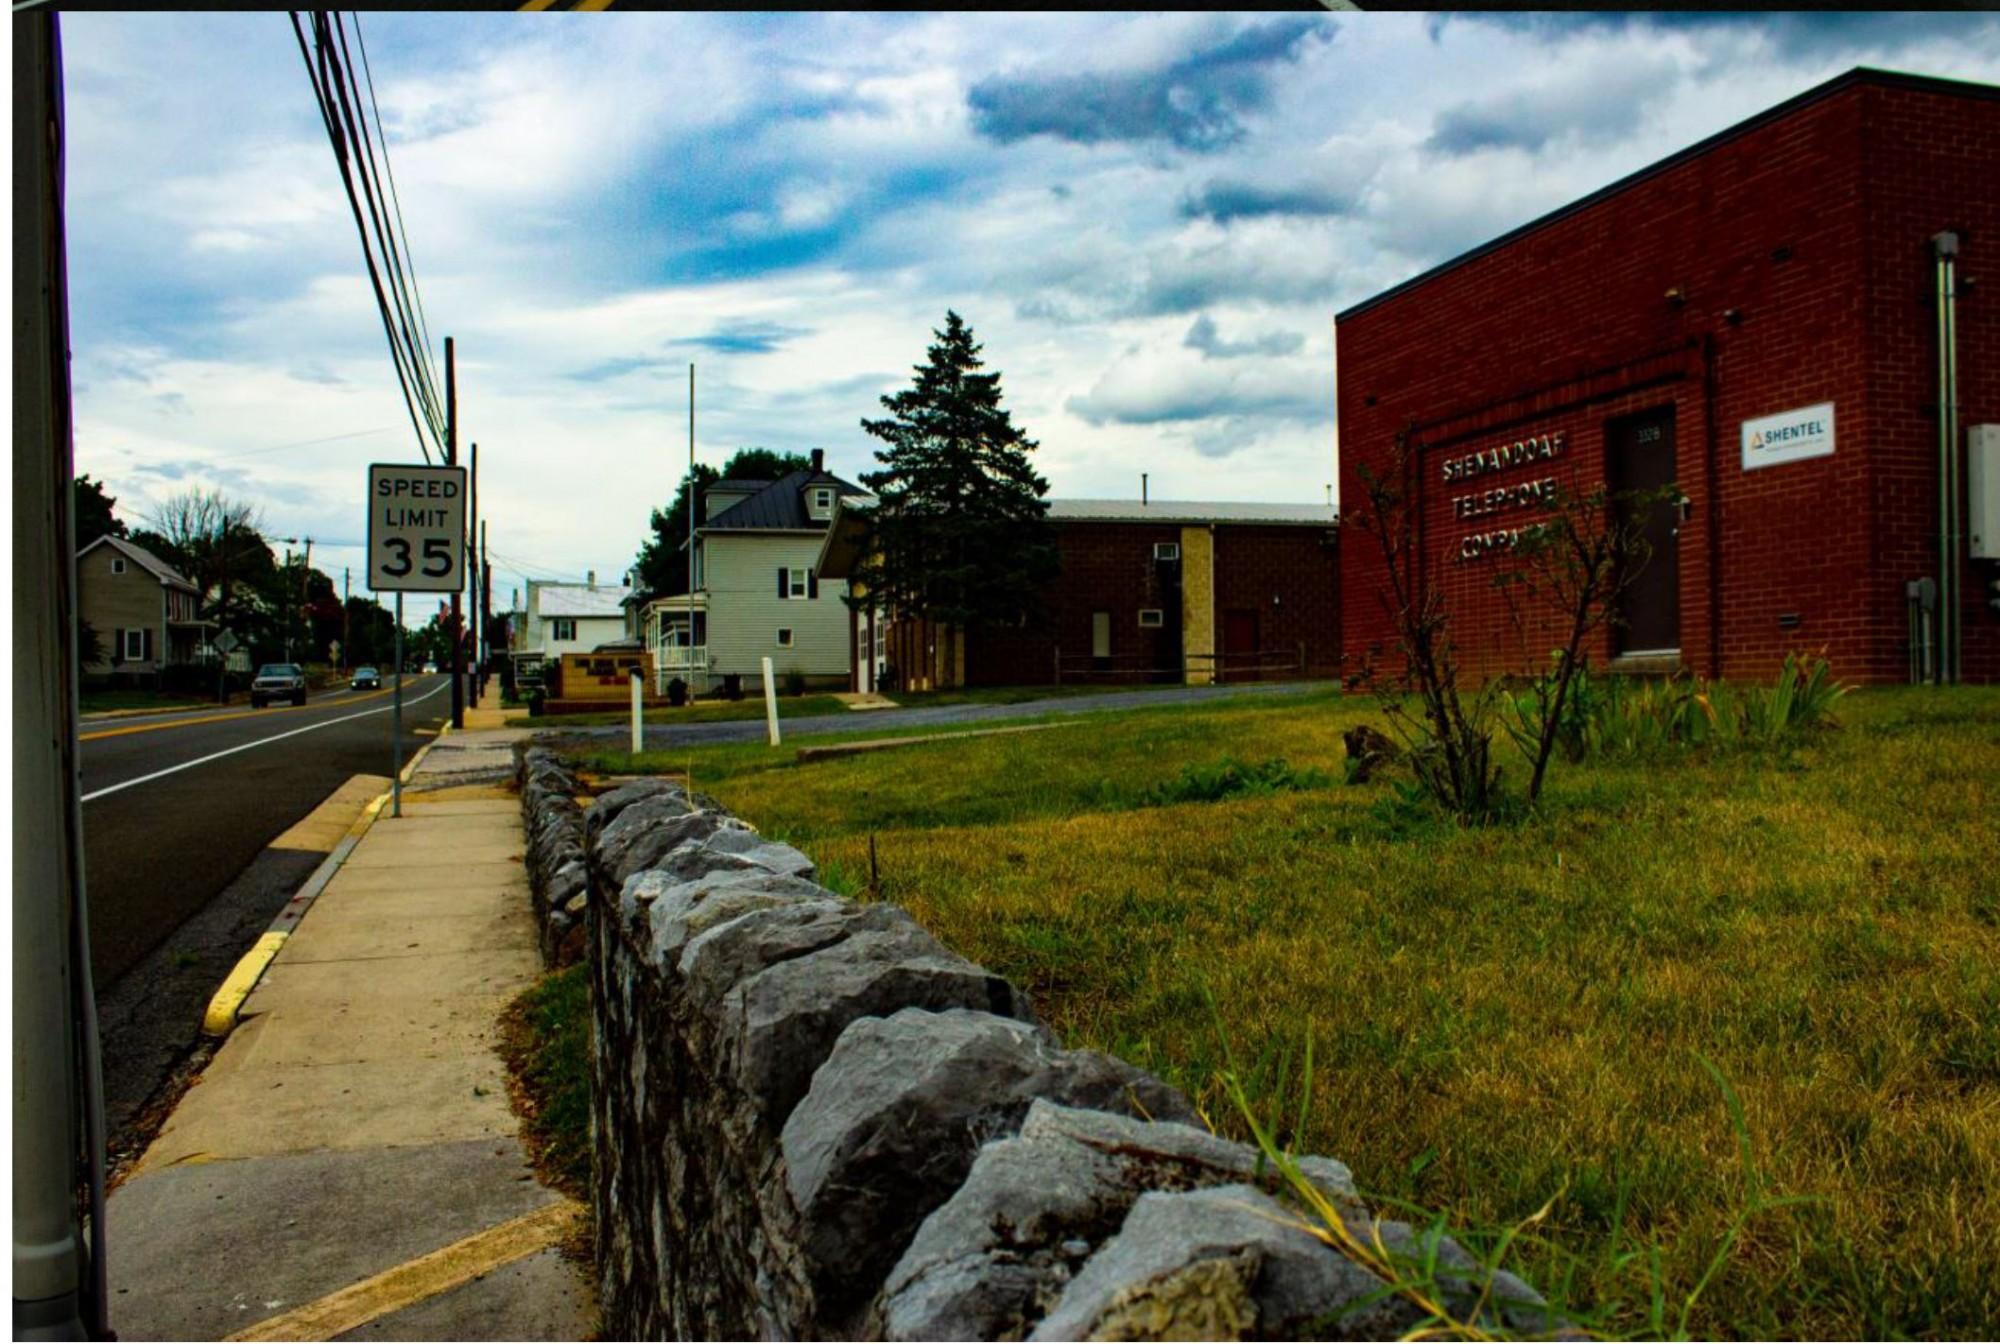 Shenandoah County Office of Economic Development